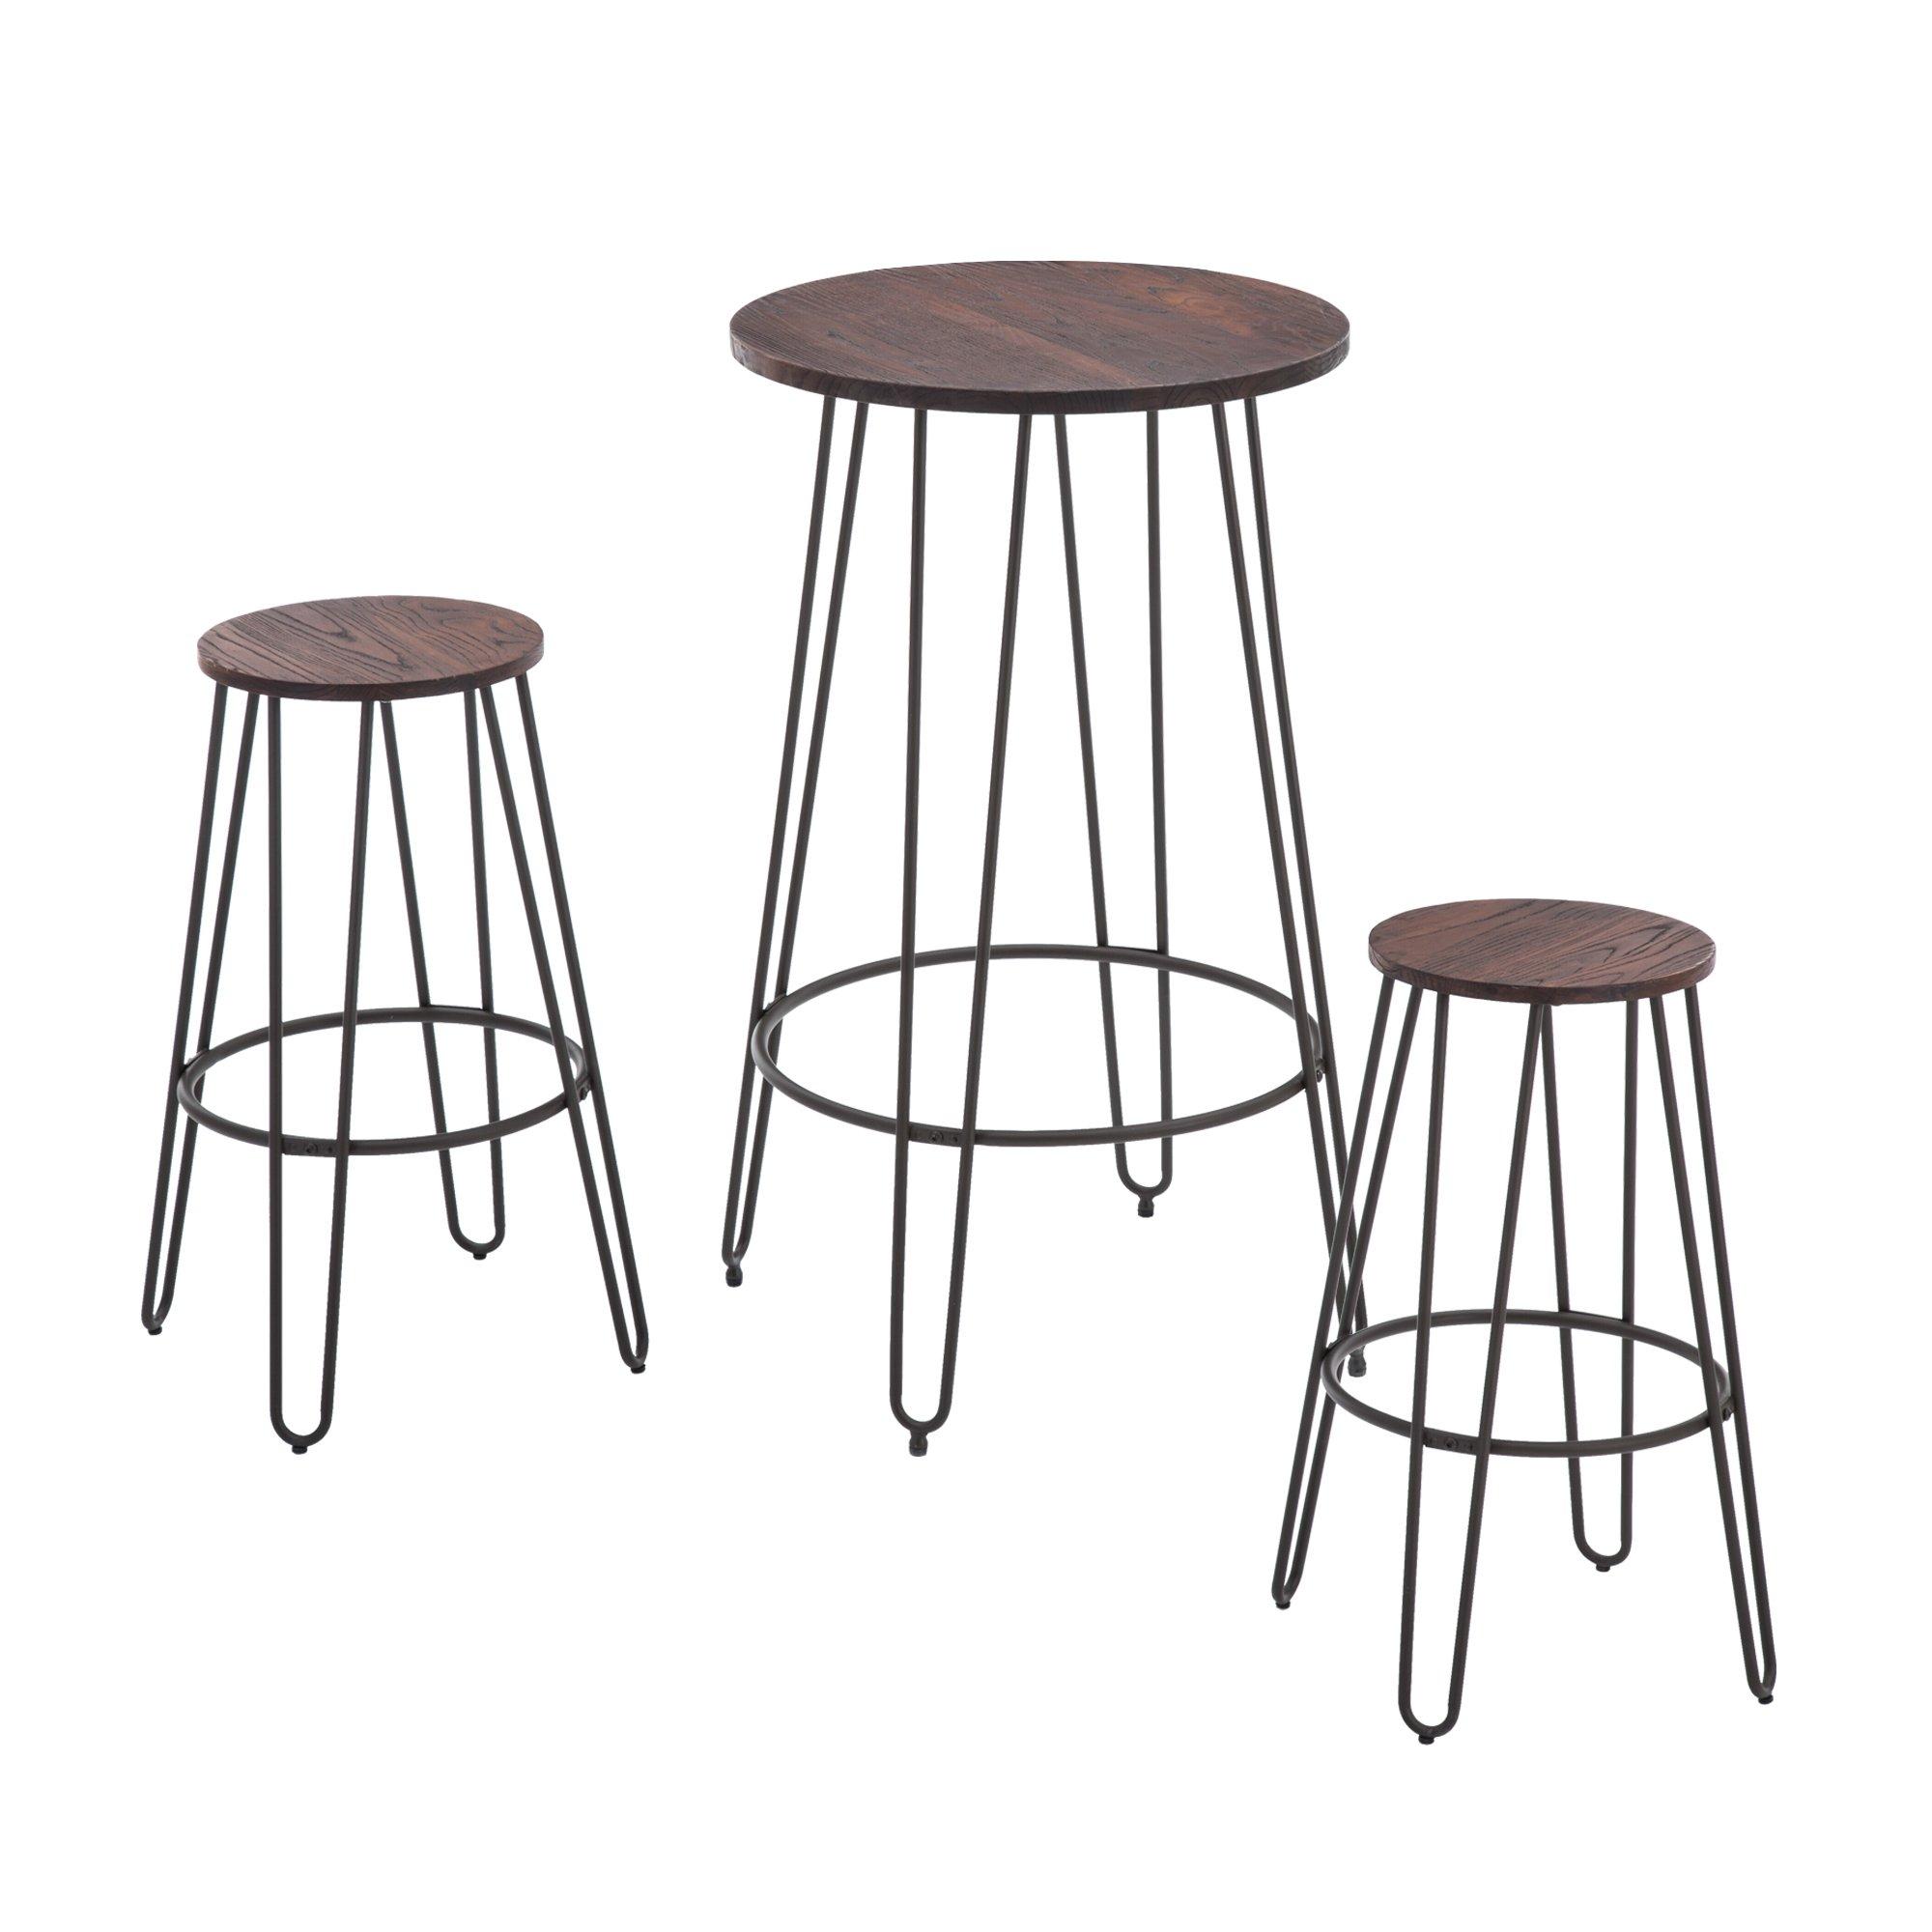 NOBPEINT 3 Piece Bar Table Set 2 Stools Bistro Pub Kitchen Dining Furniture, Rustic Brown